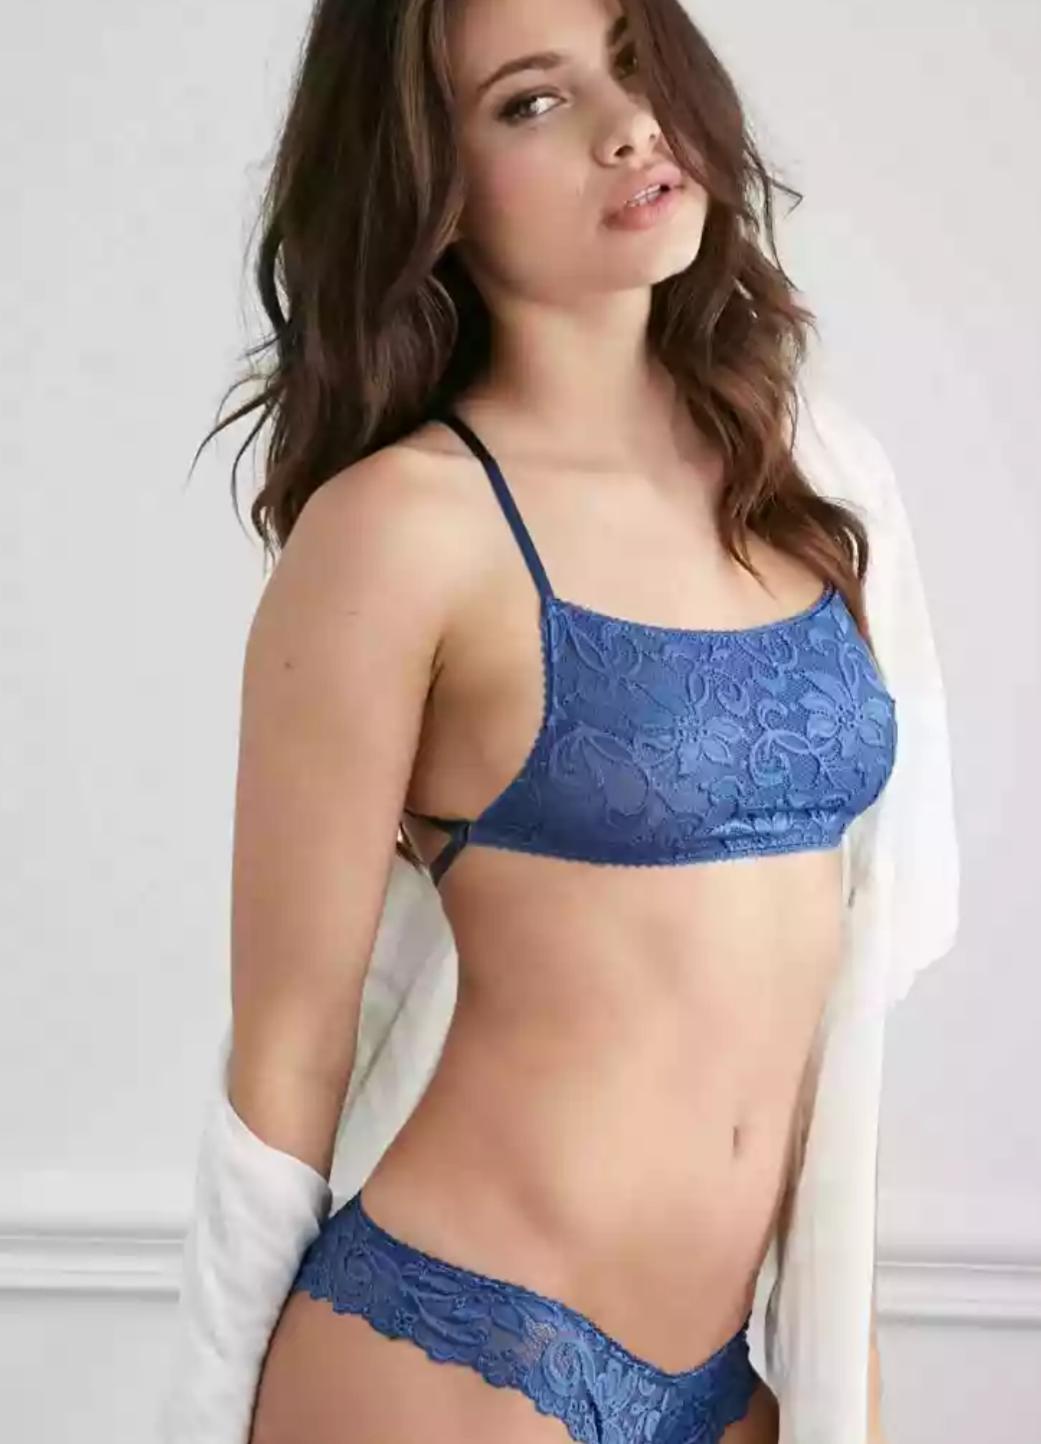 Gorgeous bra model